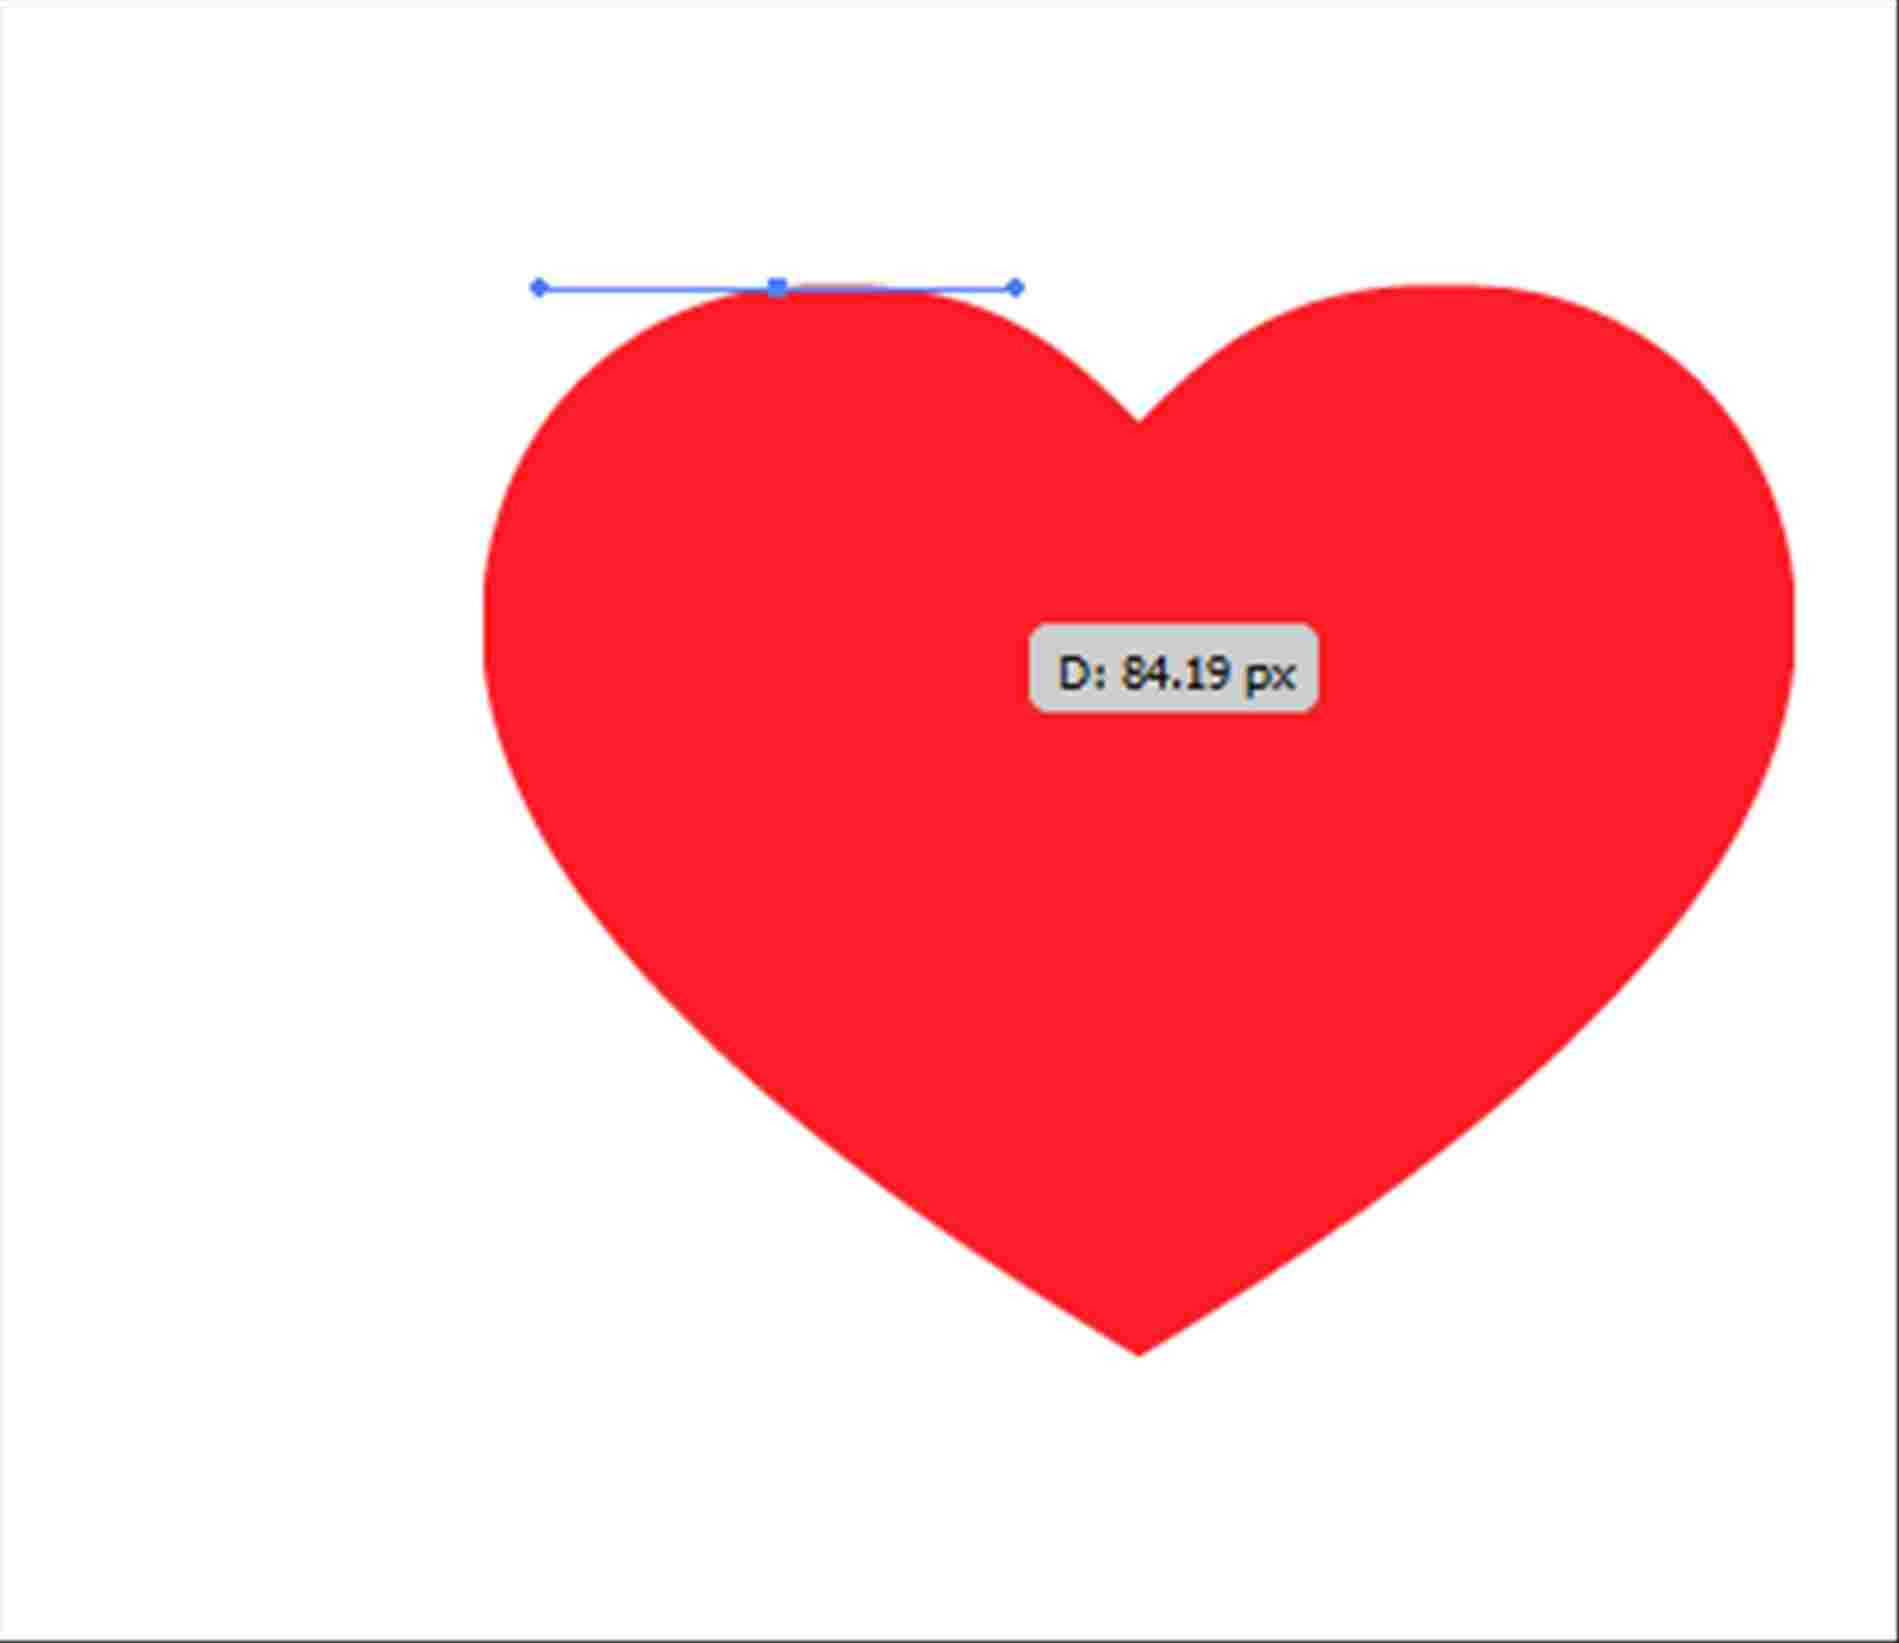 1899x1643 Free Downloadsrhvecteezycom Free Vector Heart Shape Illustrator